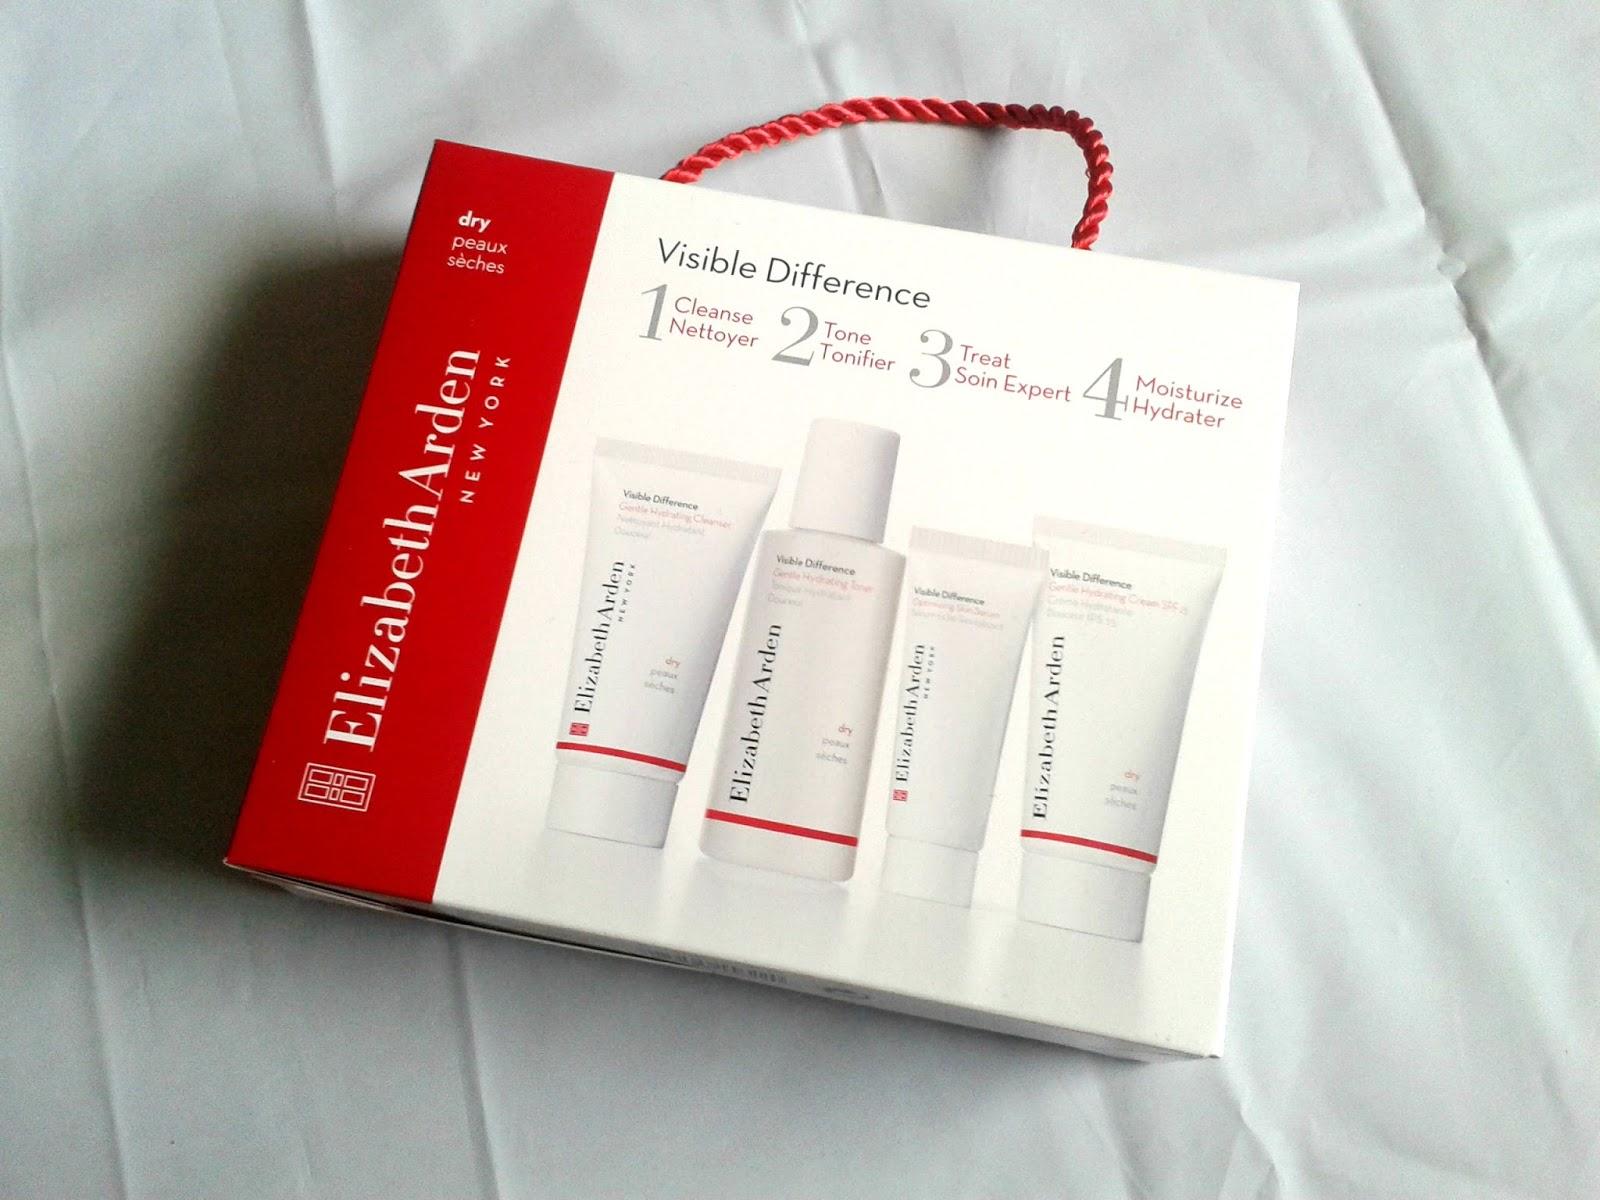 Elizabeth Arden Visible Difference Dry Skin Set